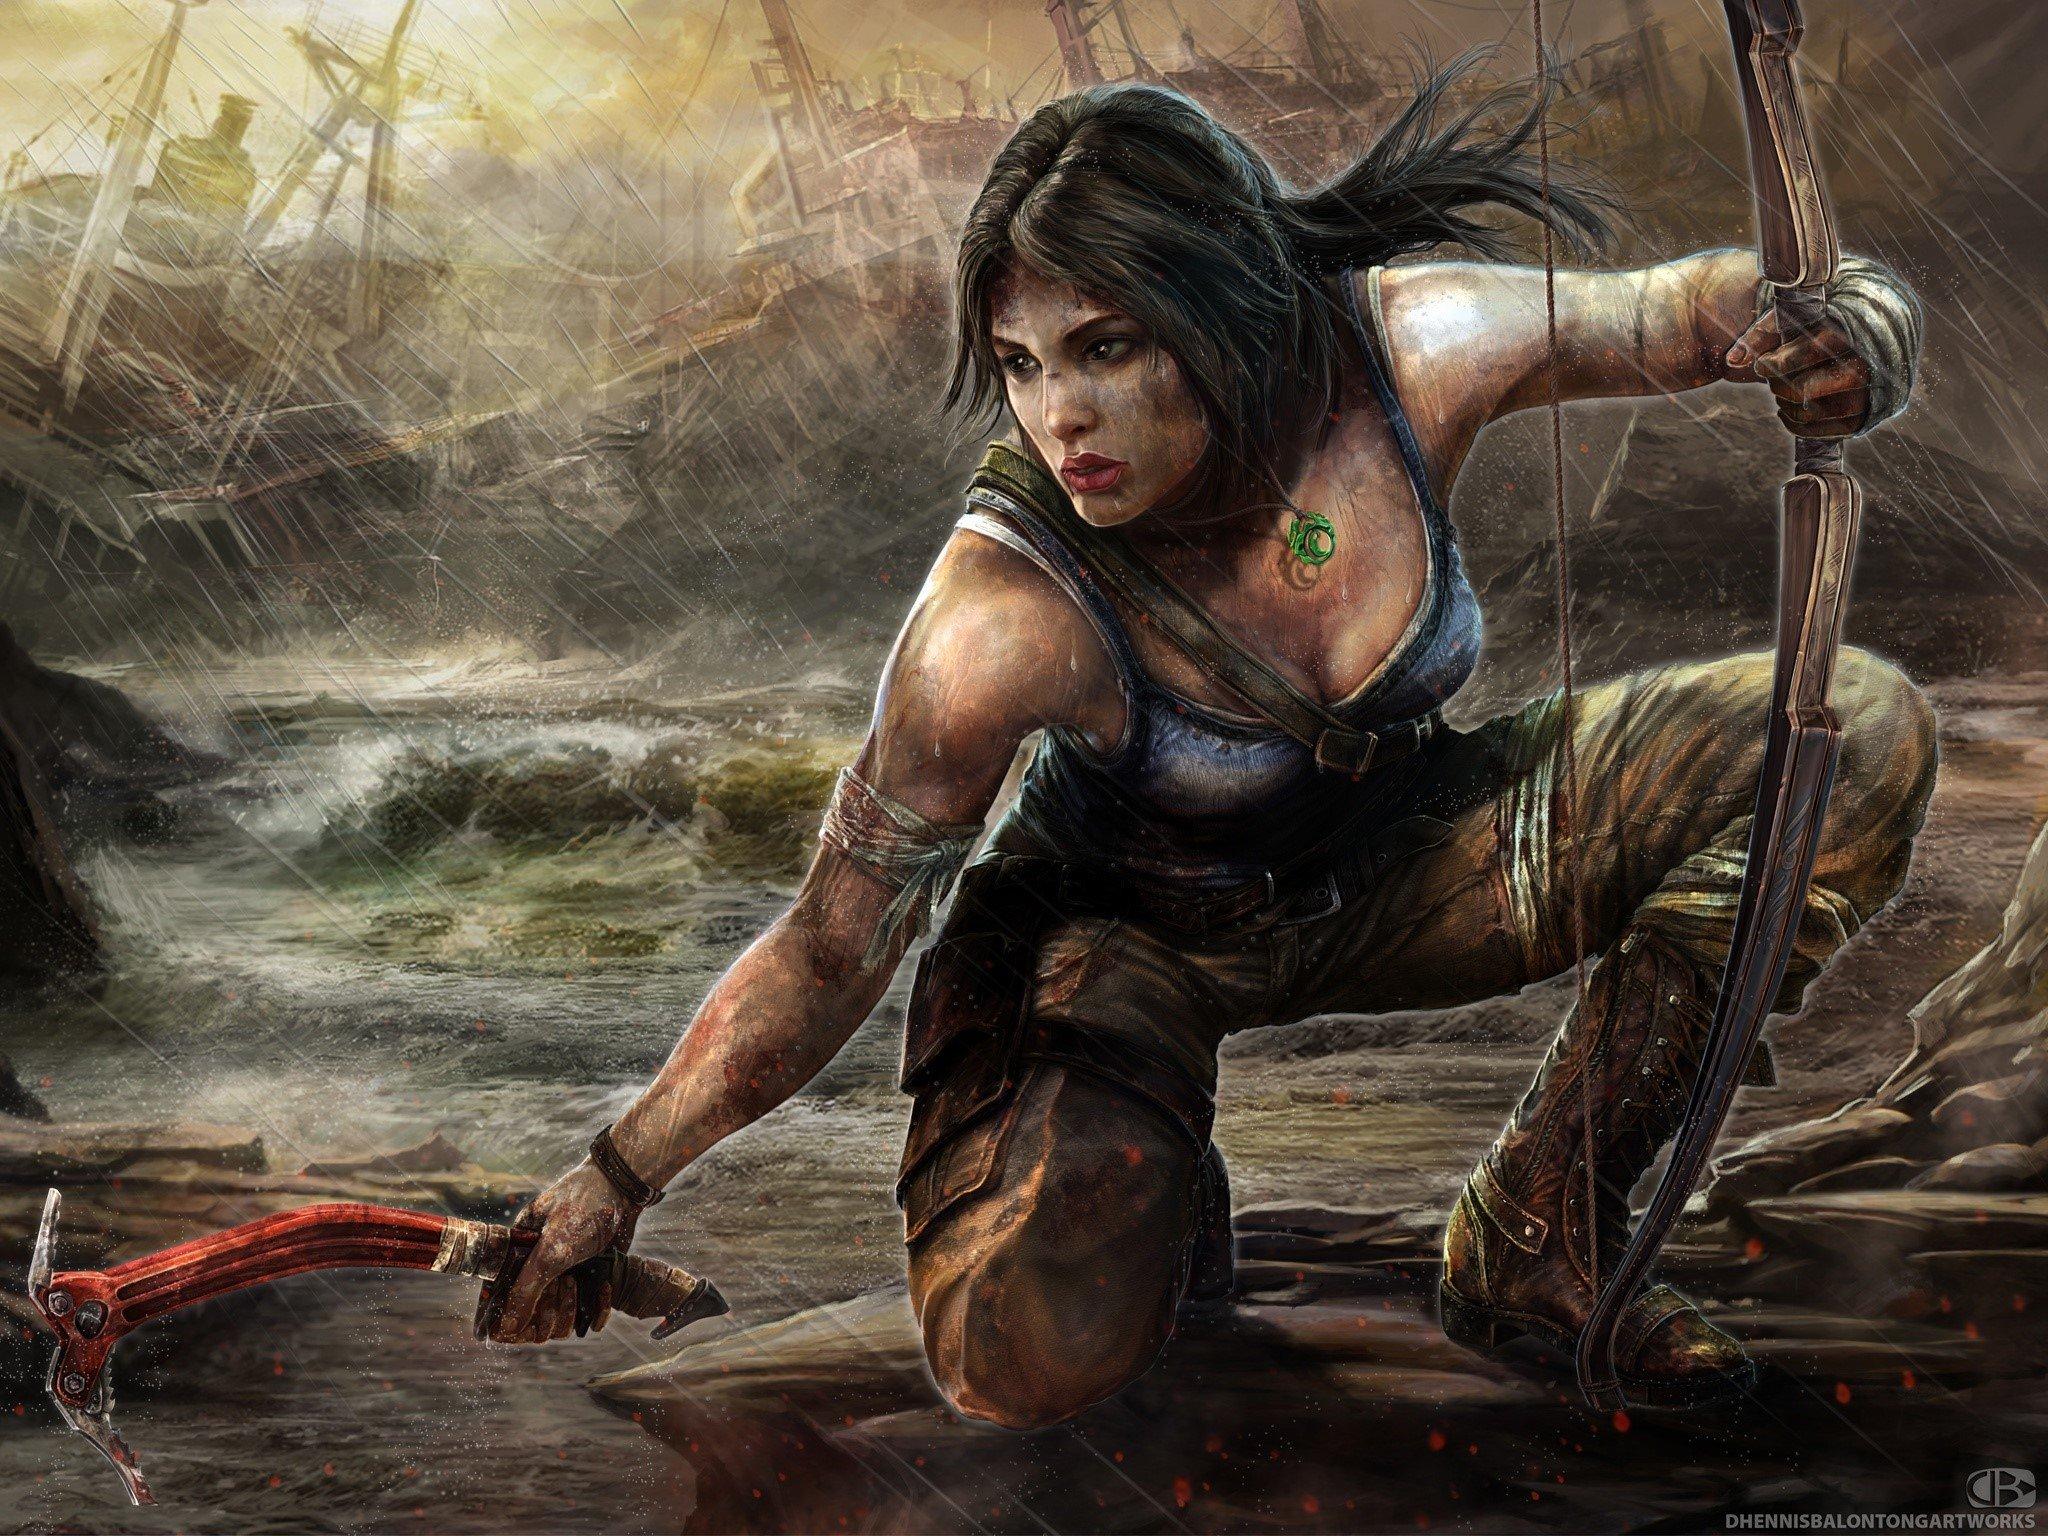 Fondos de pantalla Dibujo de Lara Croft Tomb Raider